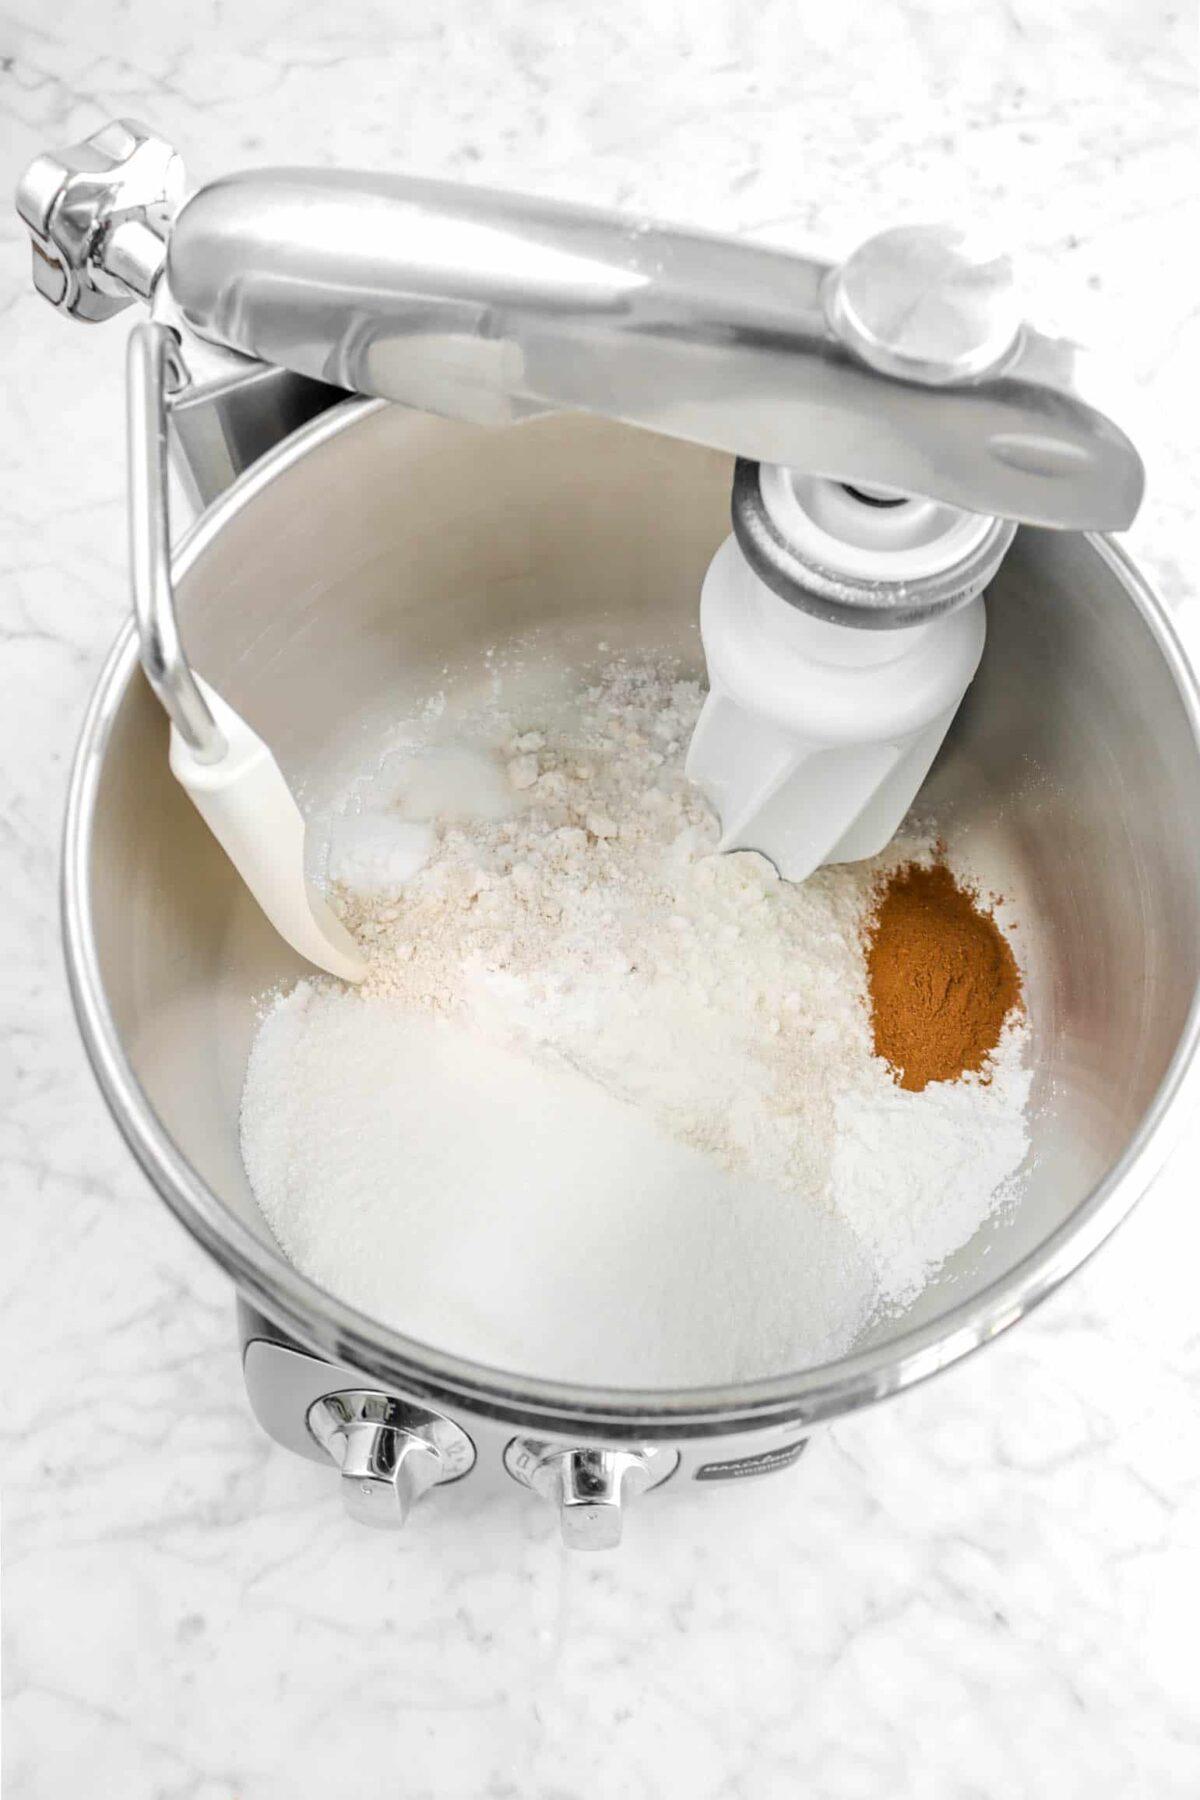 dry ingredients in mixer